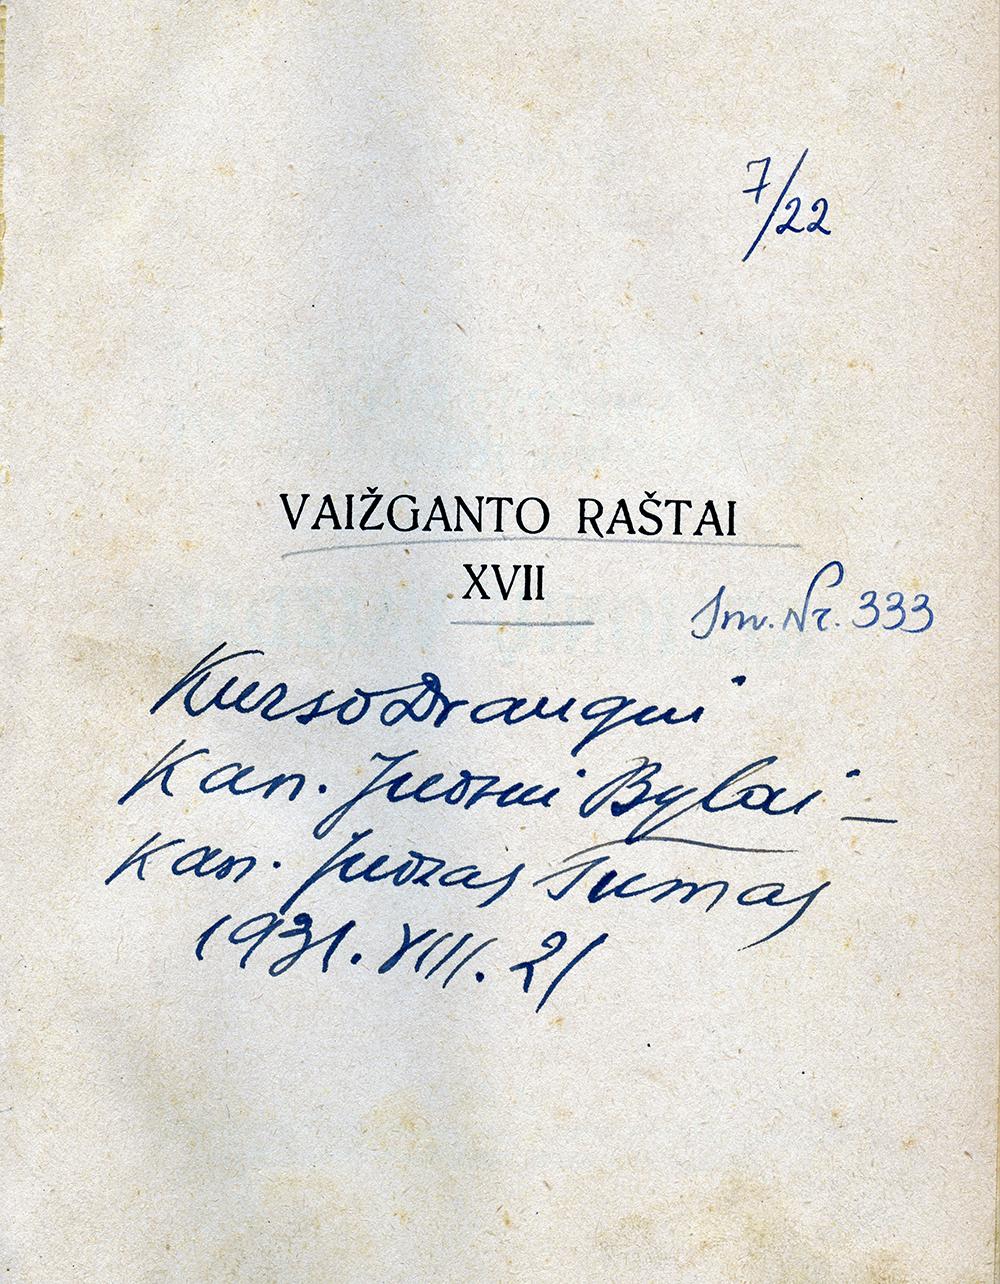 Naujausias J. Tumo Vaižganto eksponatas fonduose. Rašytojo ranka rašyta dedikacija kun. Juozui Bylai.